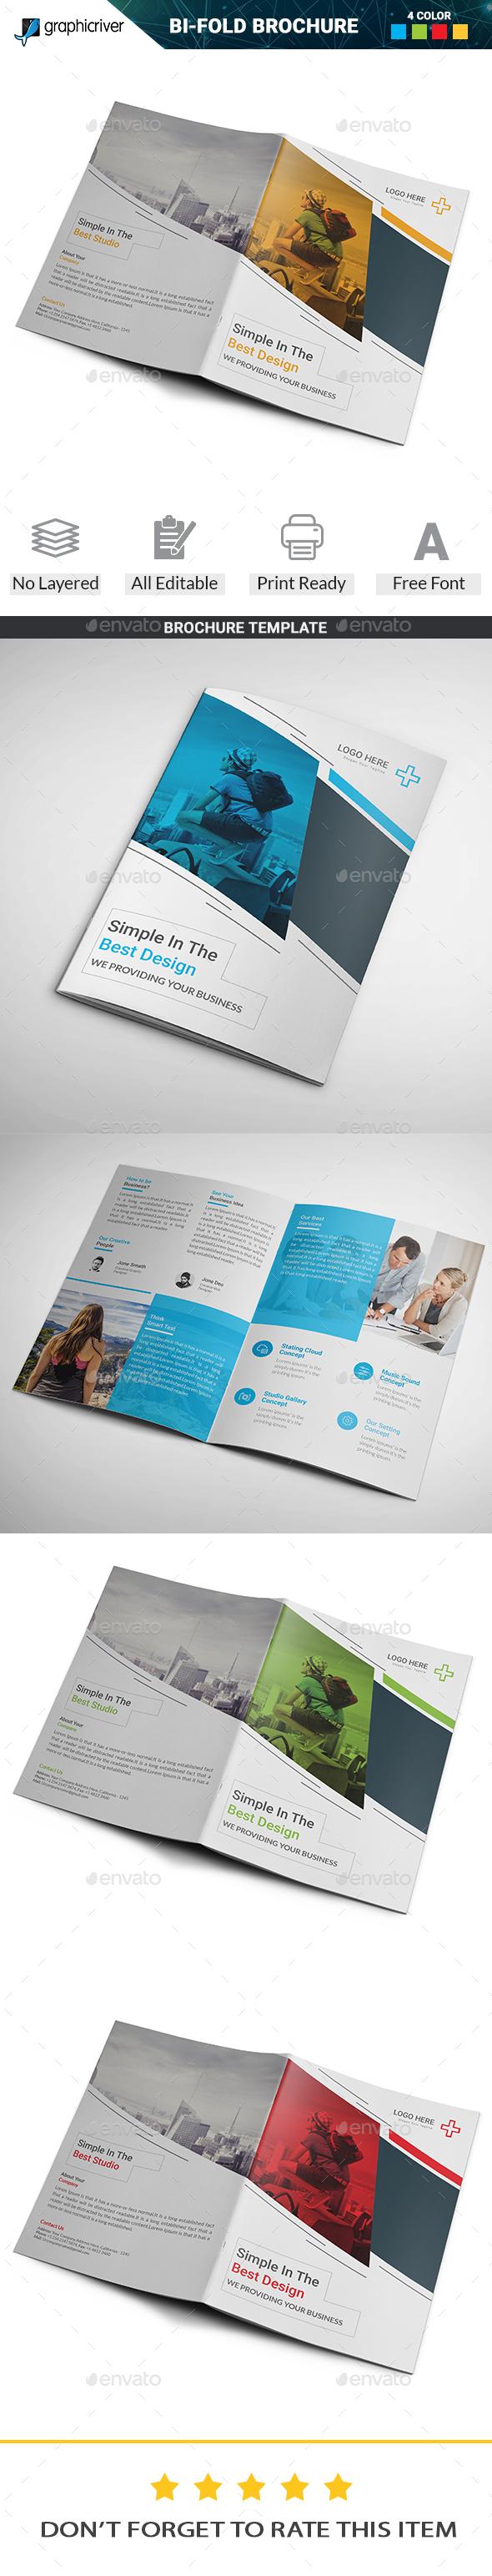 BiFold Brochure Template Ai Illustrator  Brochure Templates